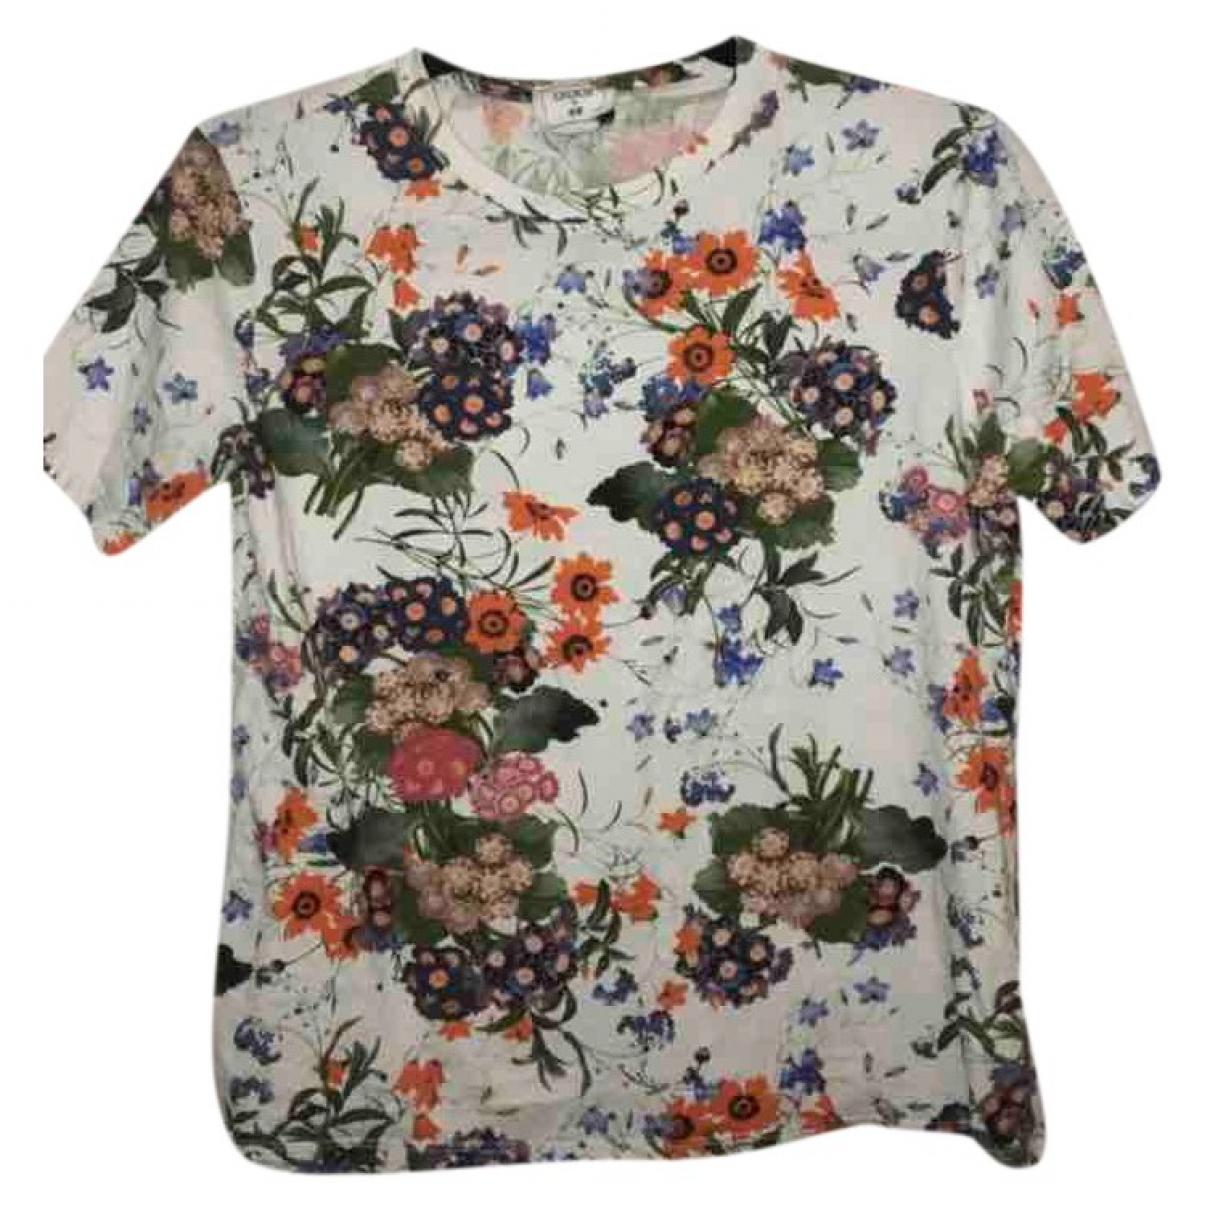 Erdem X H&m \N White Cotton  top for Women S International